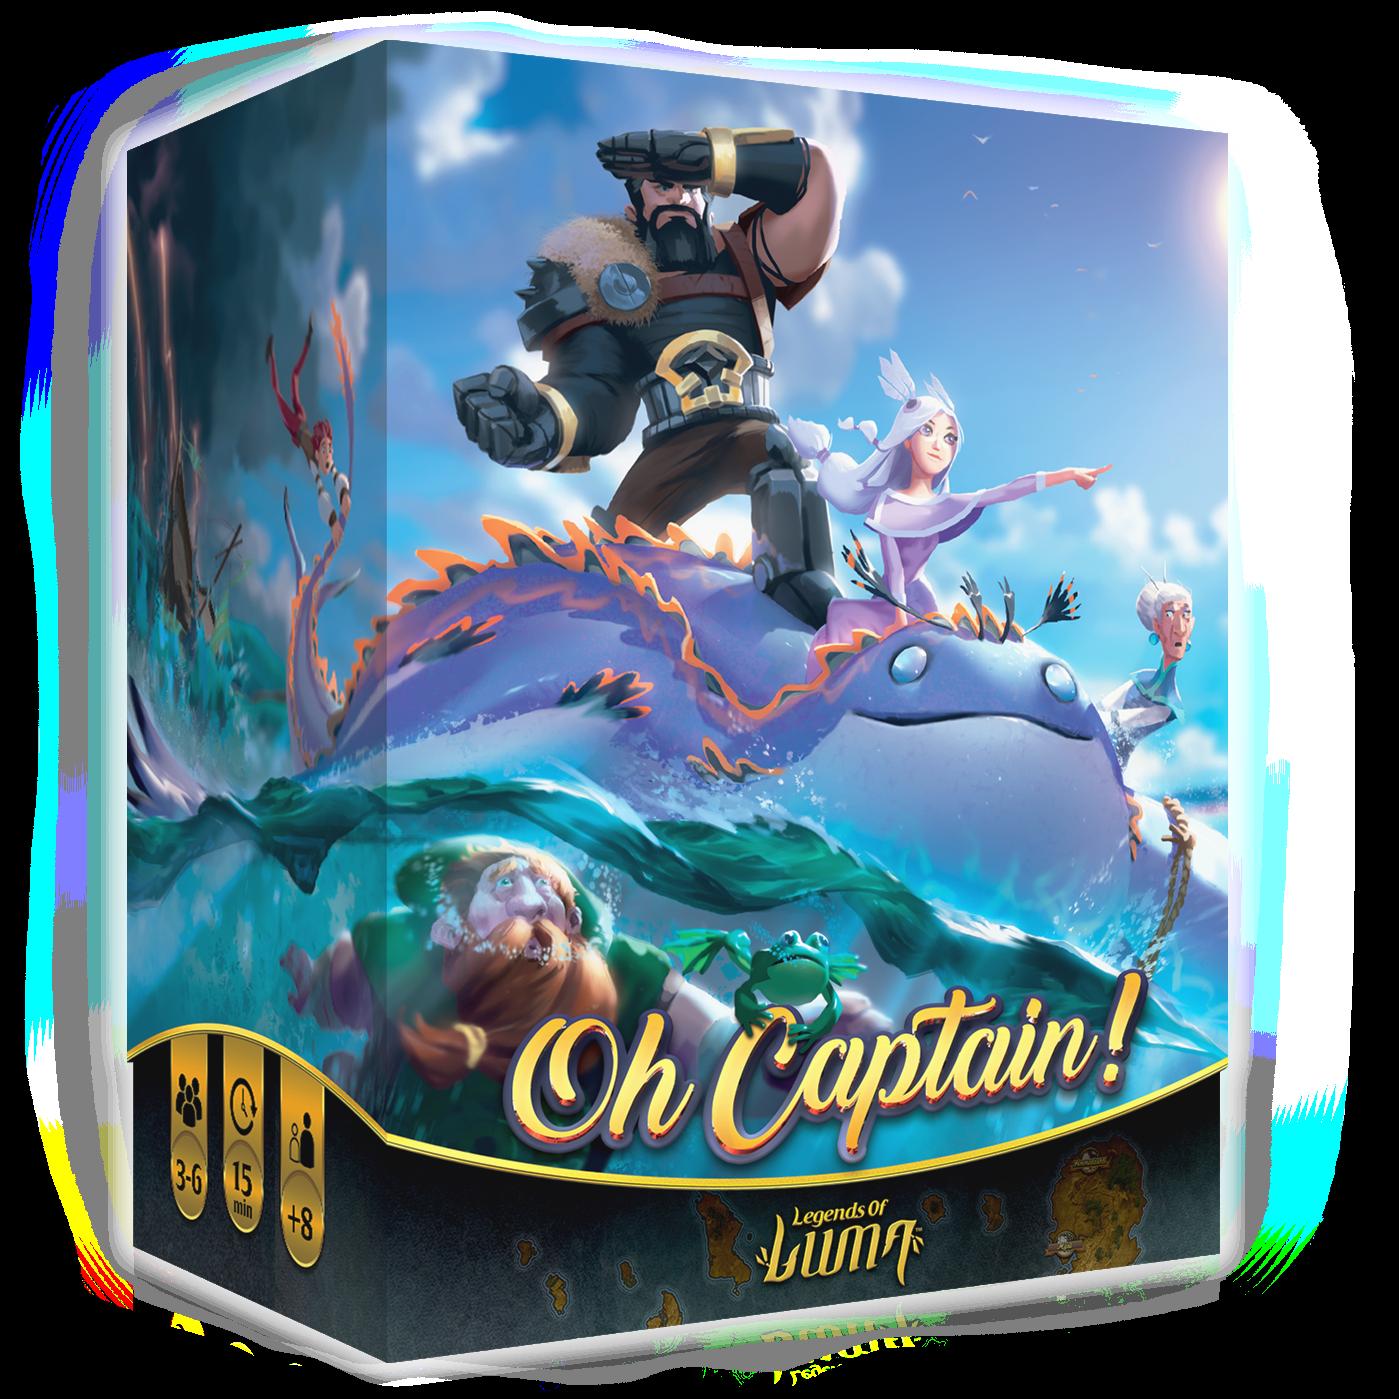 Oh Capitaine - Boite